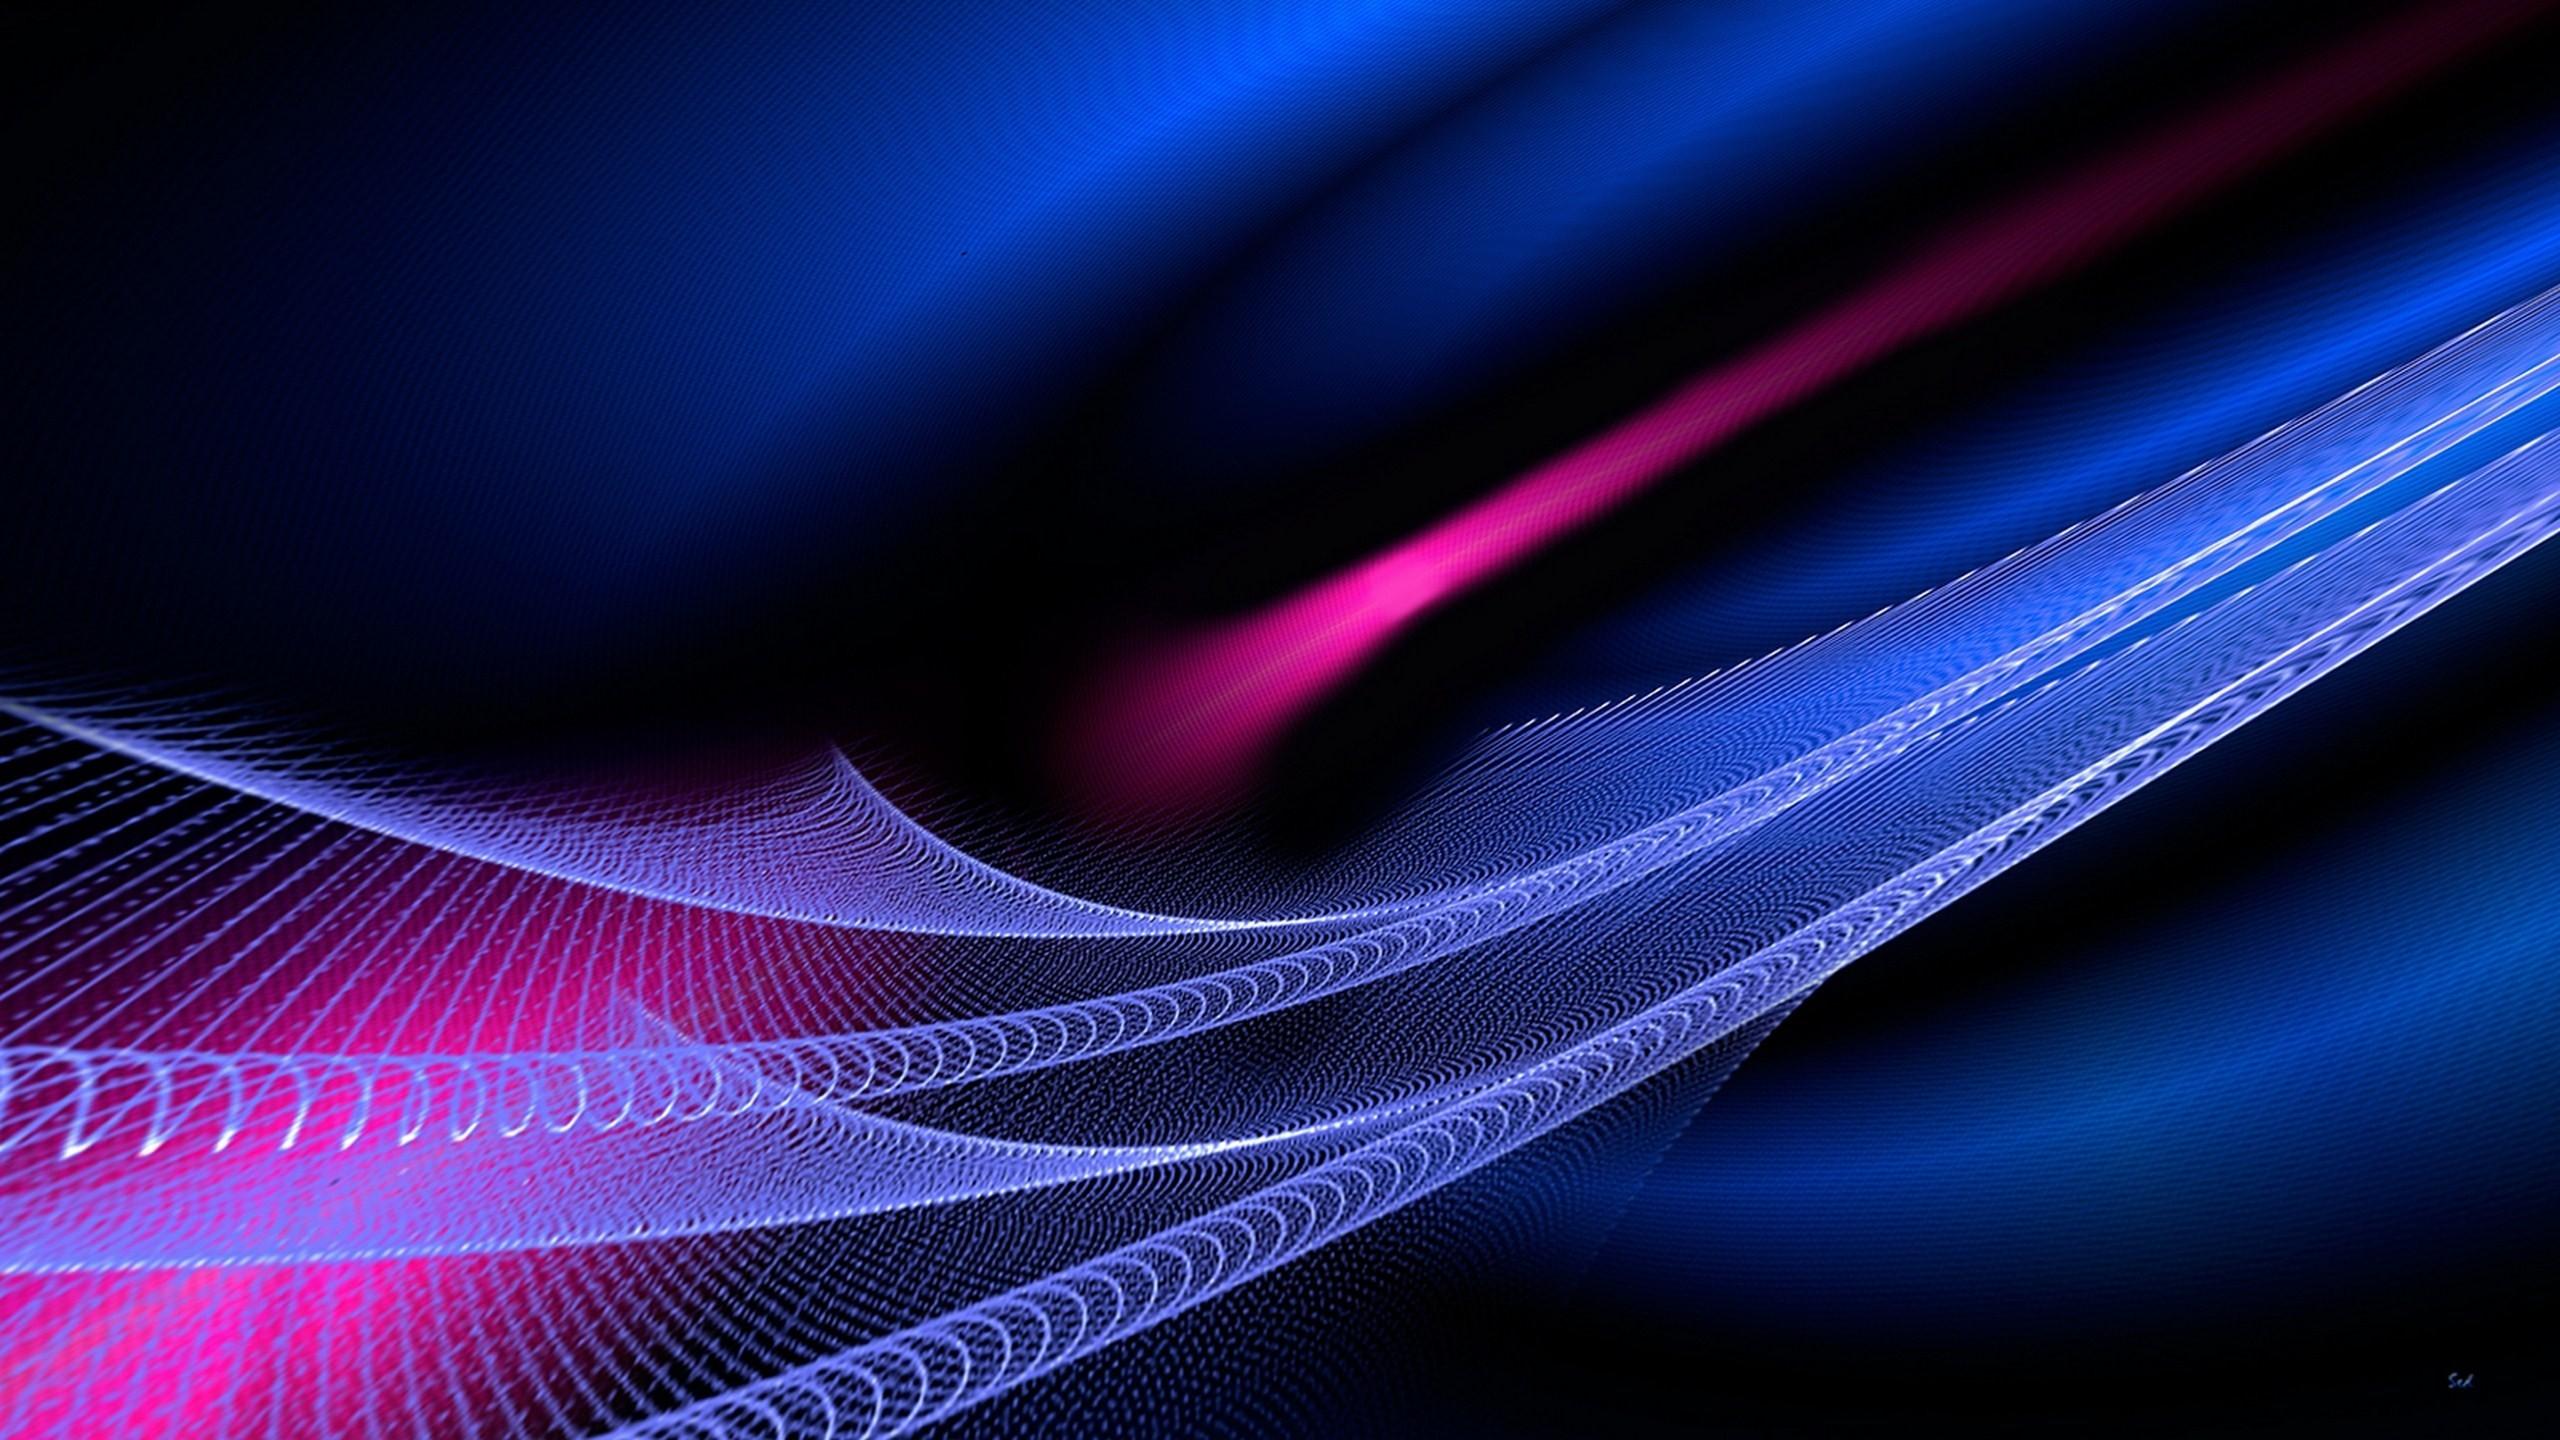 electromagnetic wallpaper – Google Search